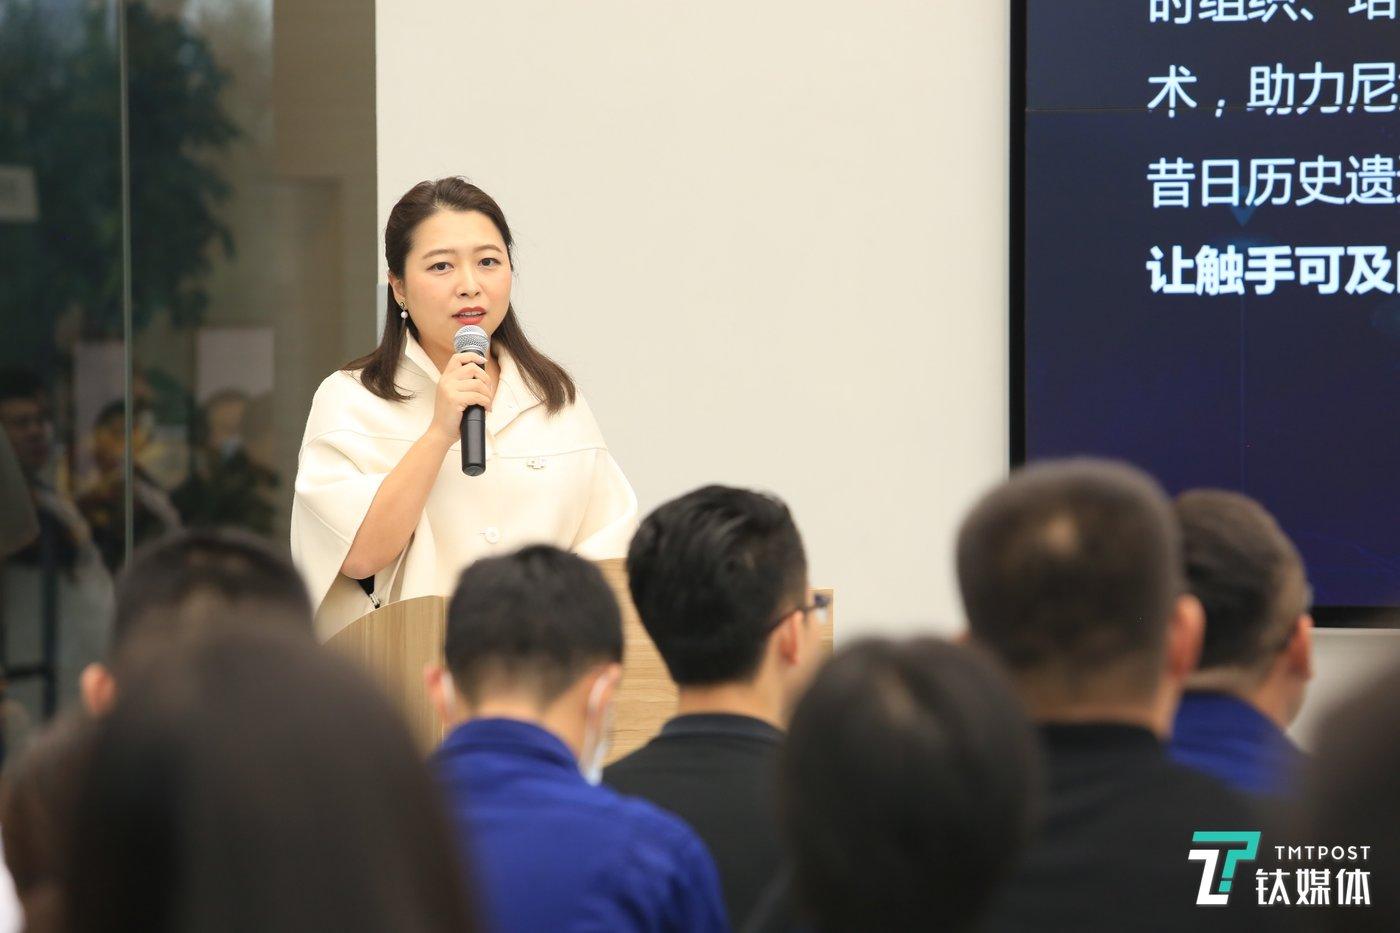 DJI大疆创新高级战略总监张晓楠